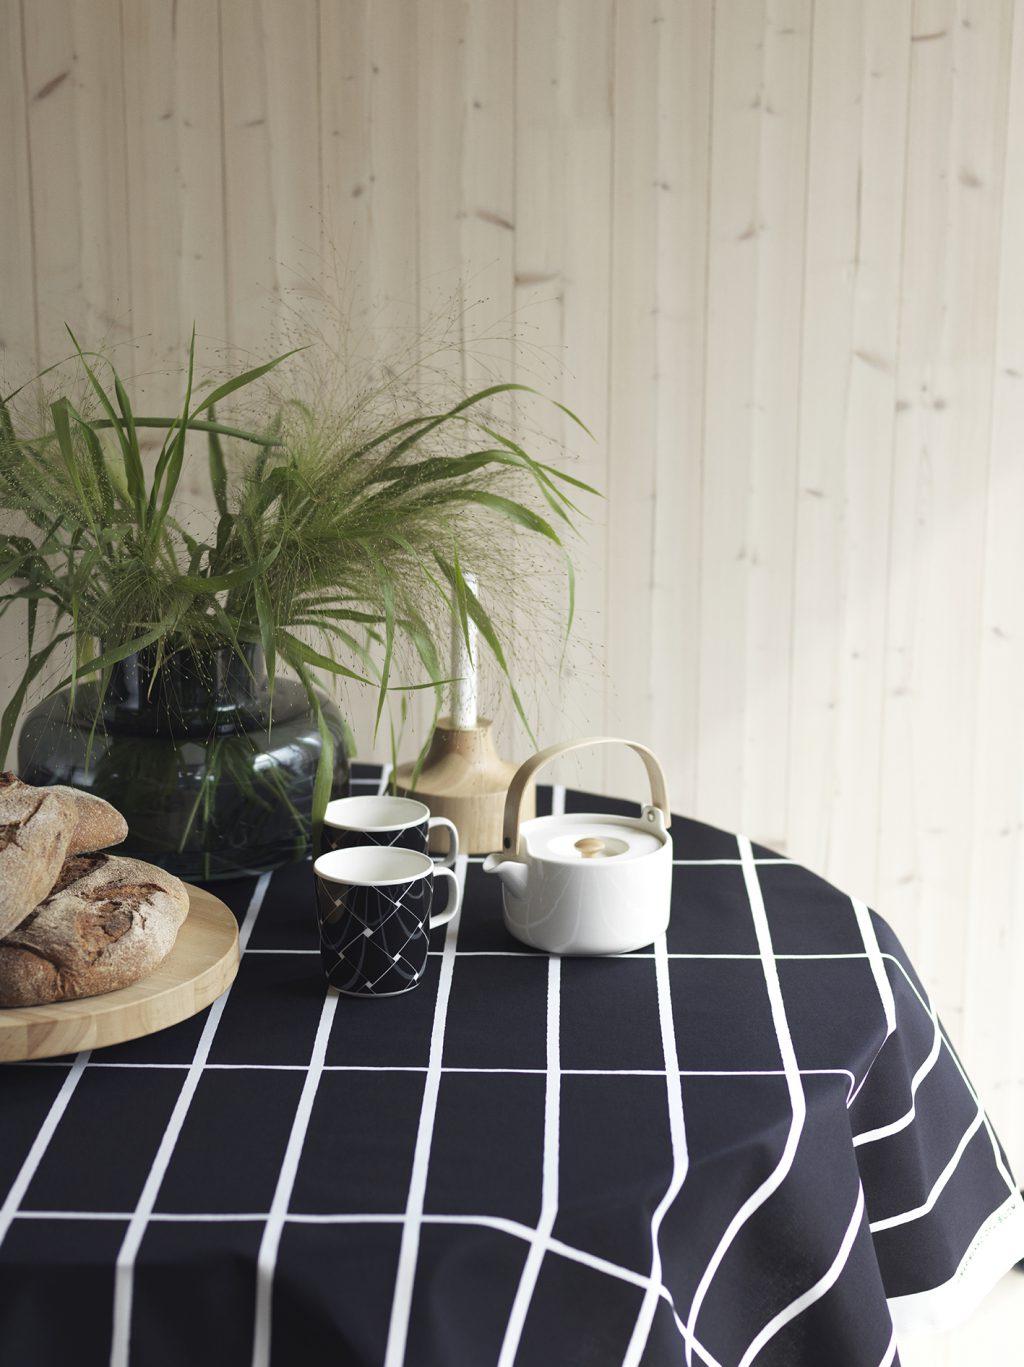 Marimekko Oiva-dishes for Marimekko by Susanna Vento